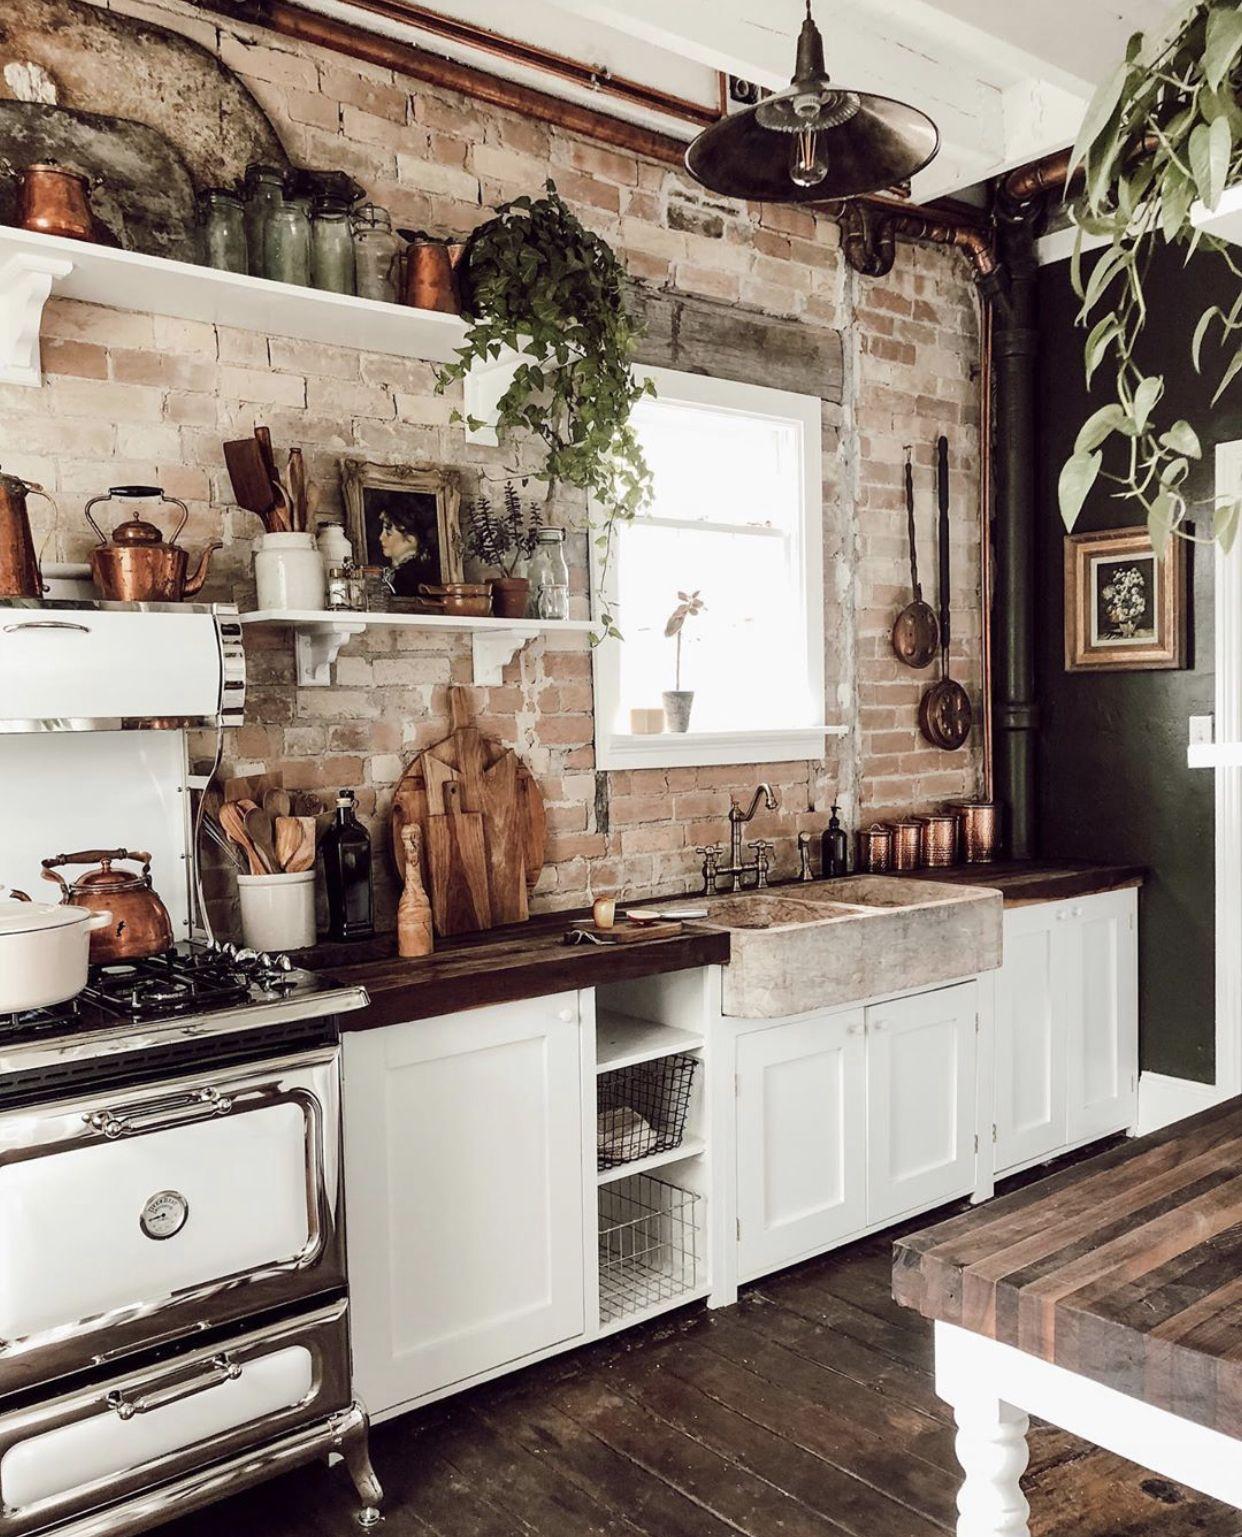 cottage kitchen open shelving vintage brick walls in the kitchen in 2020 kitchen interior on kitchen interior classic id=65220